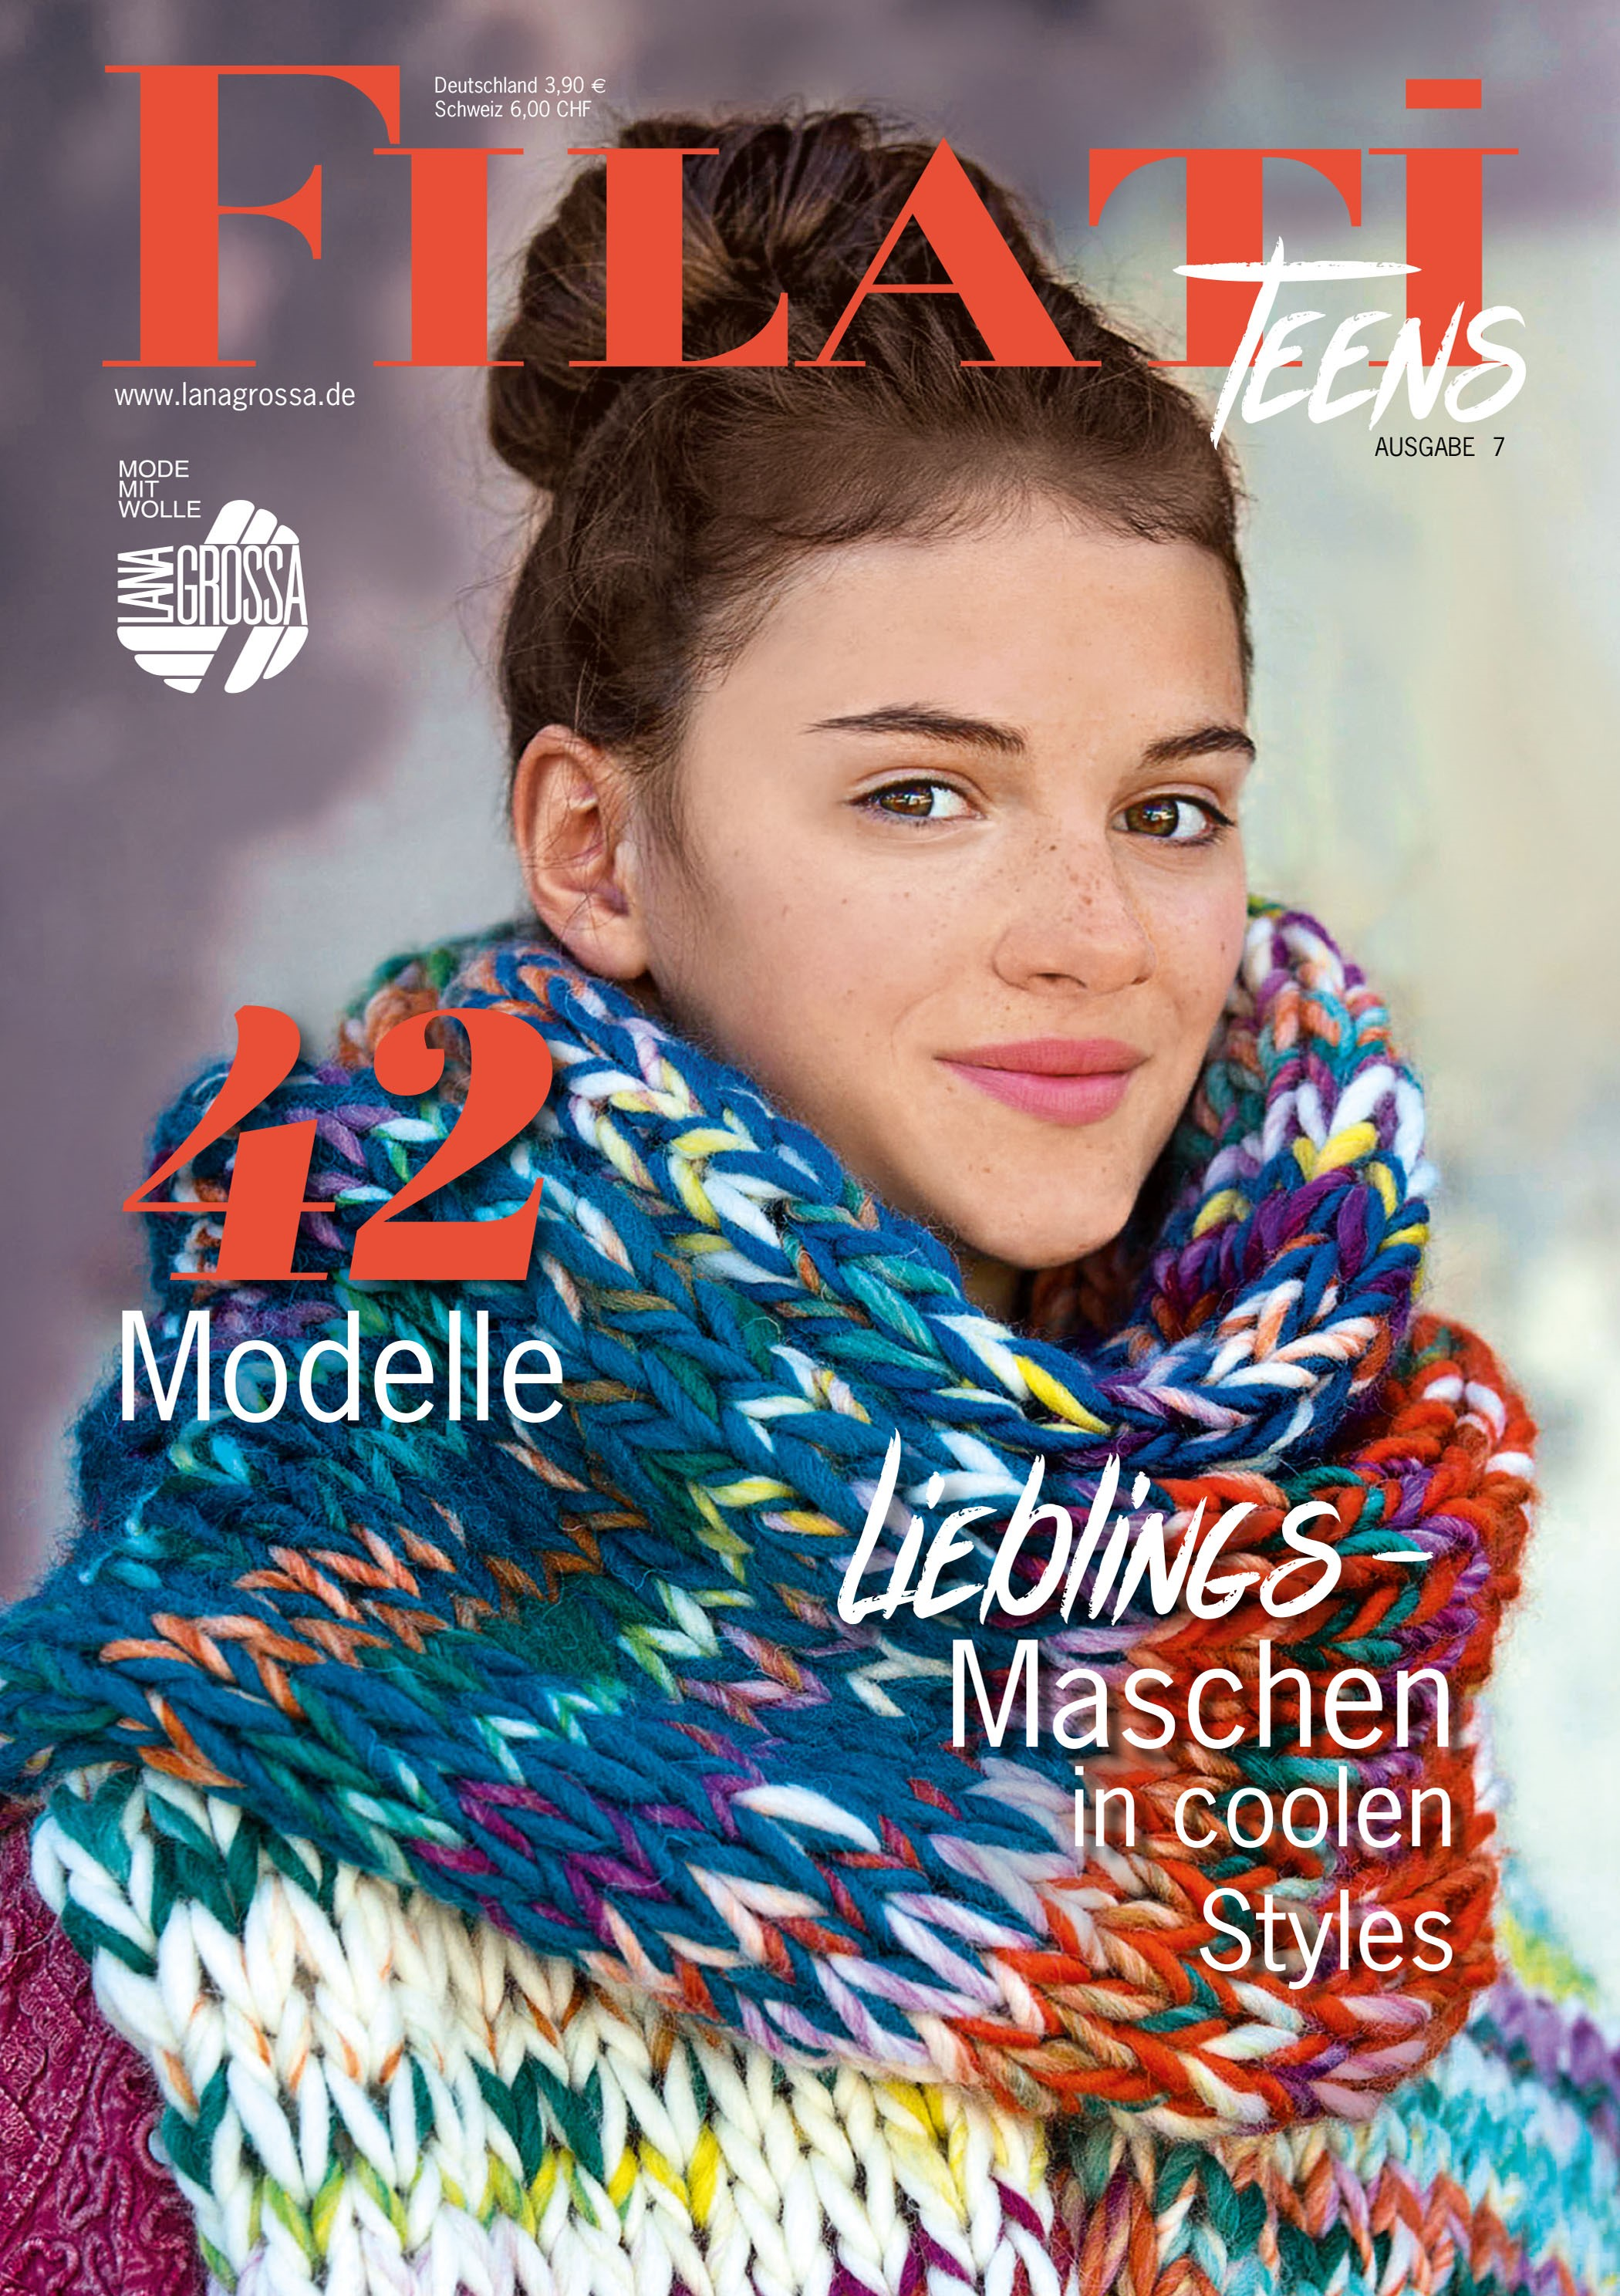 Lana Grossa FILATI Teens No. 7 - German Edition